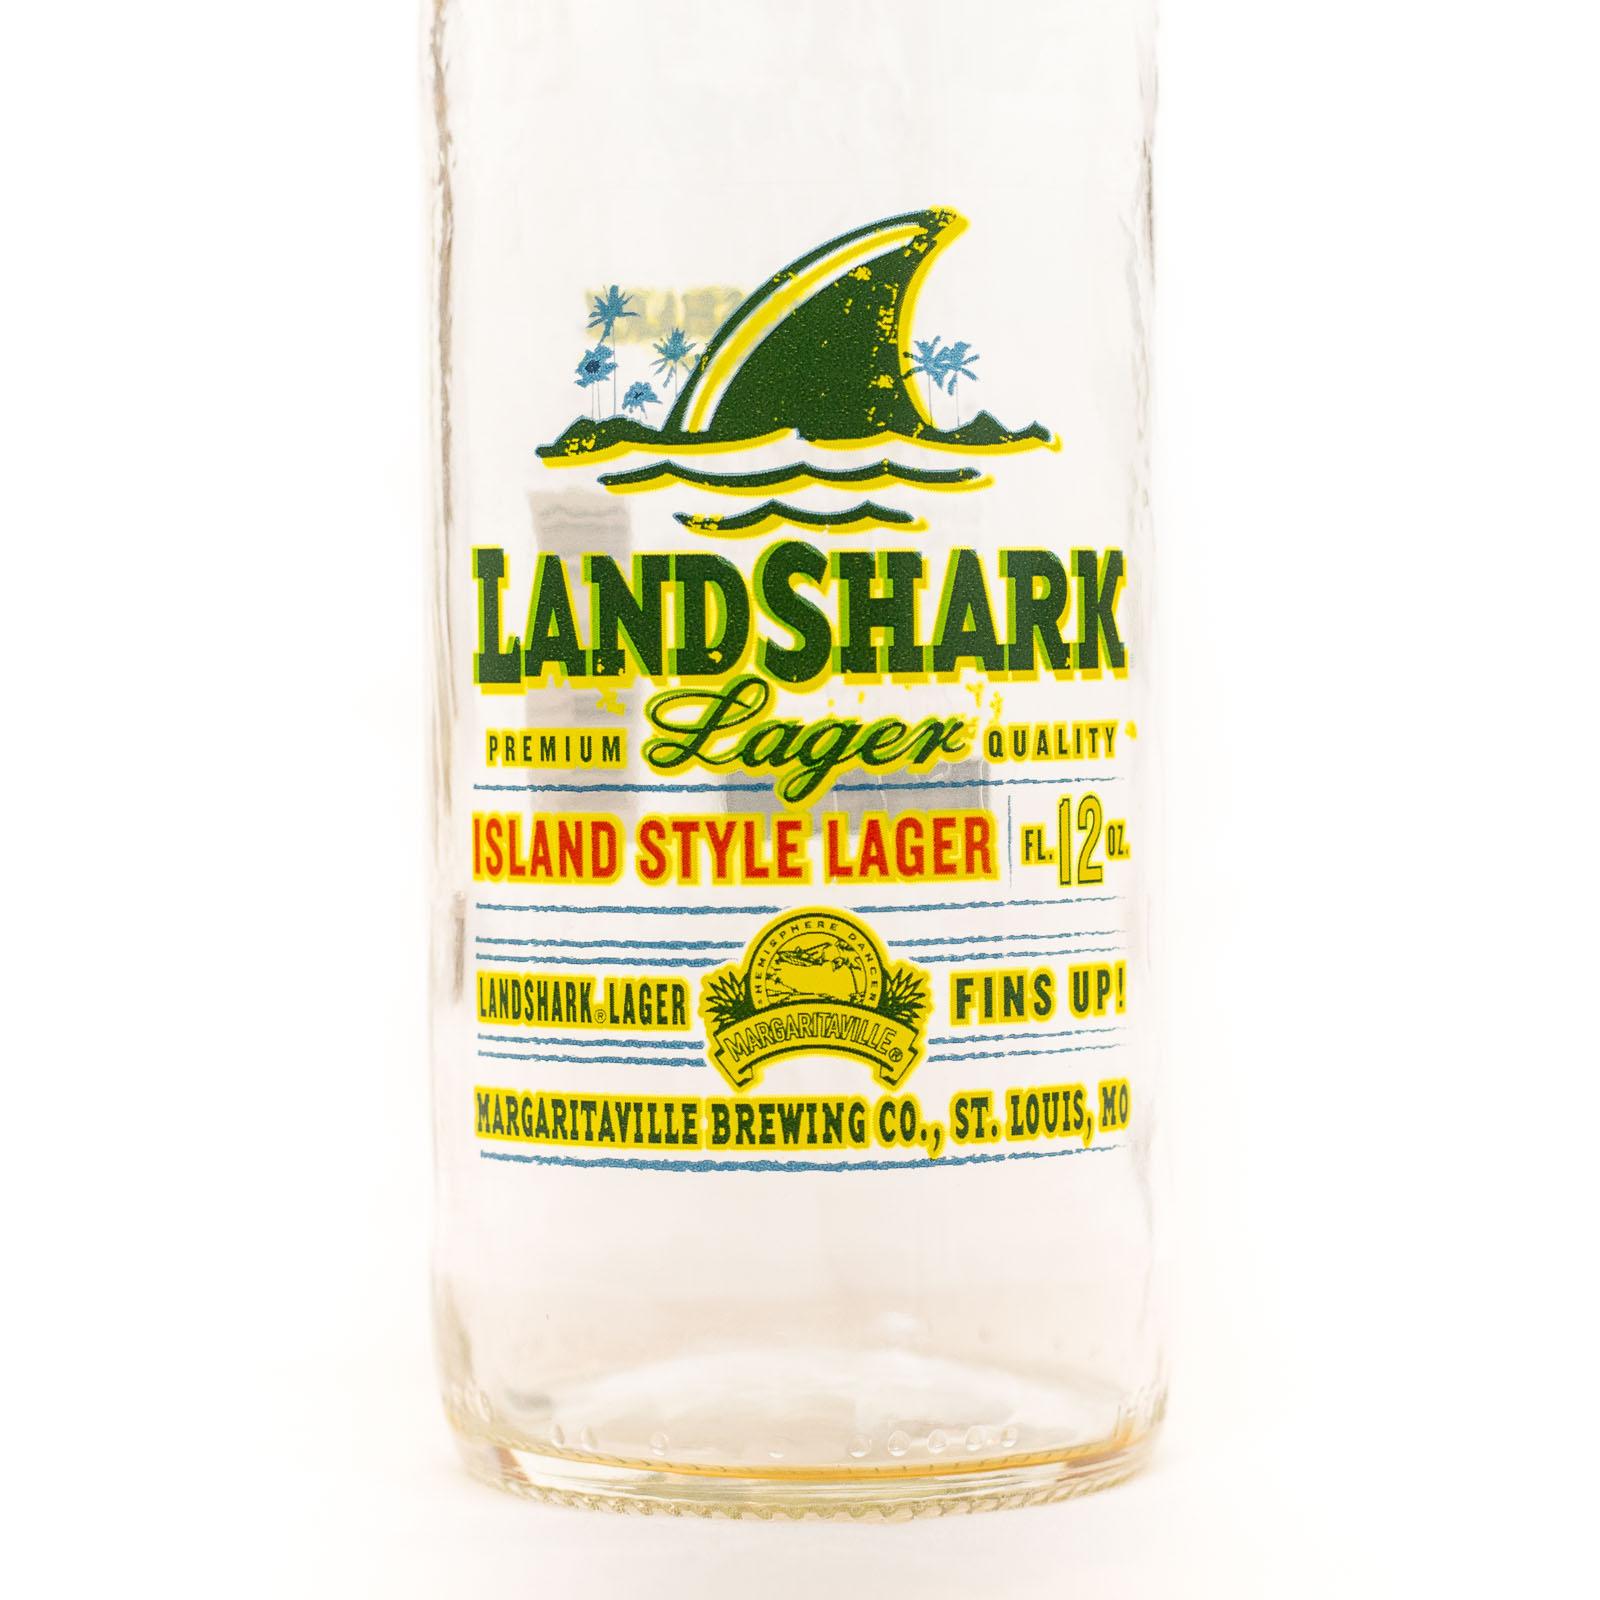 Margaritaville Brewing Company - Landshark Lager